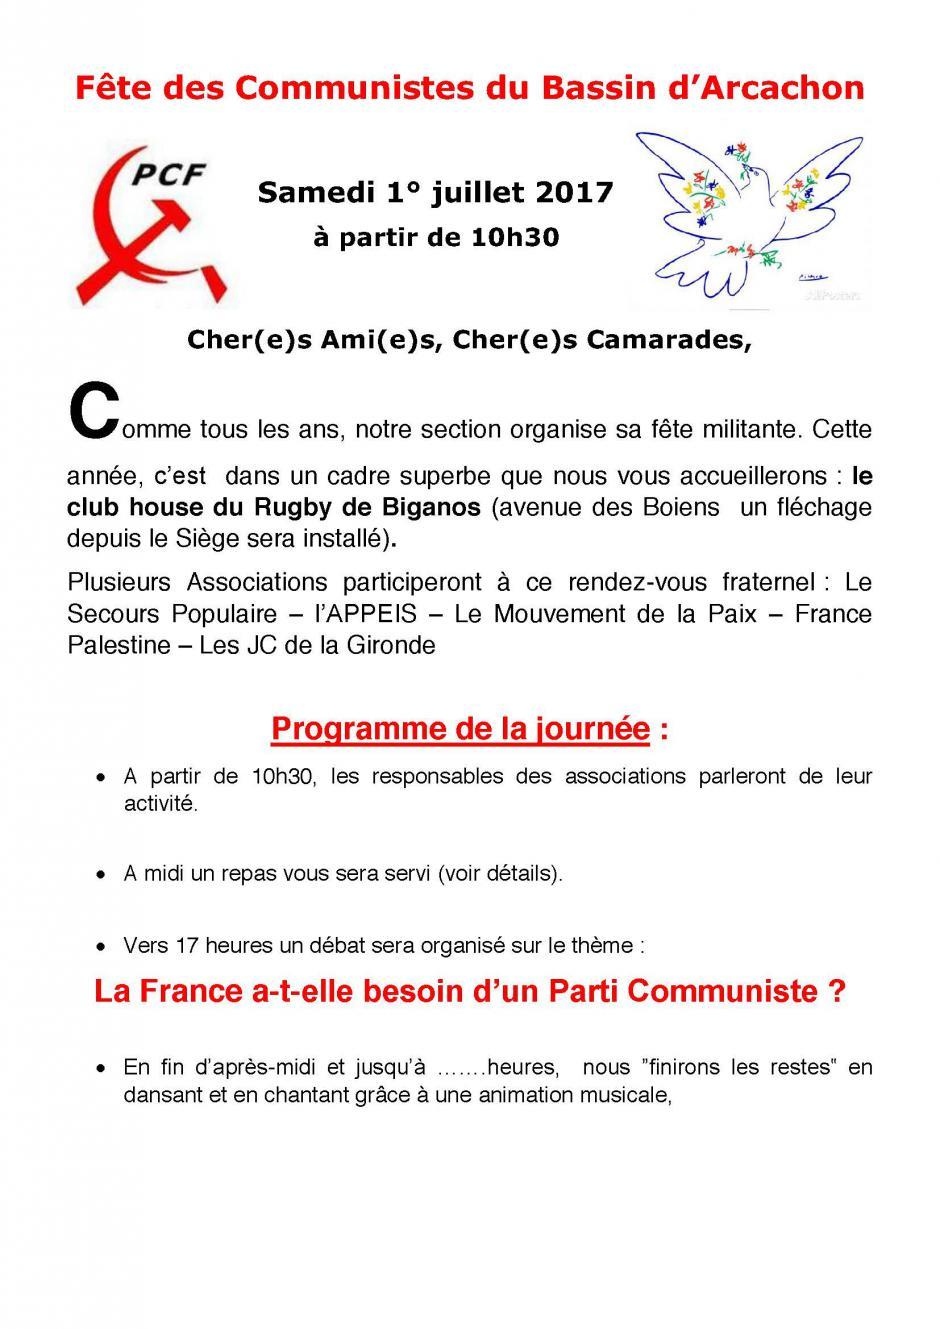 1er juillet // Fête des communistes du Bassin d'Arcachon